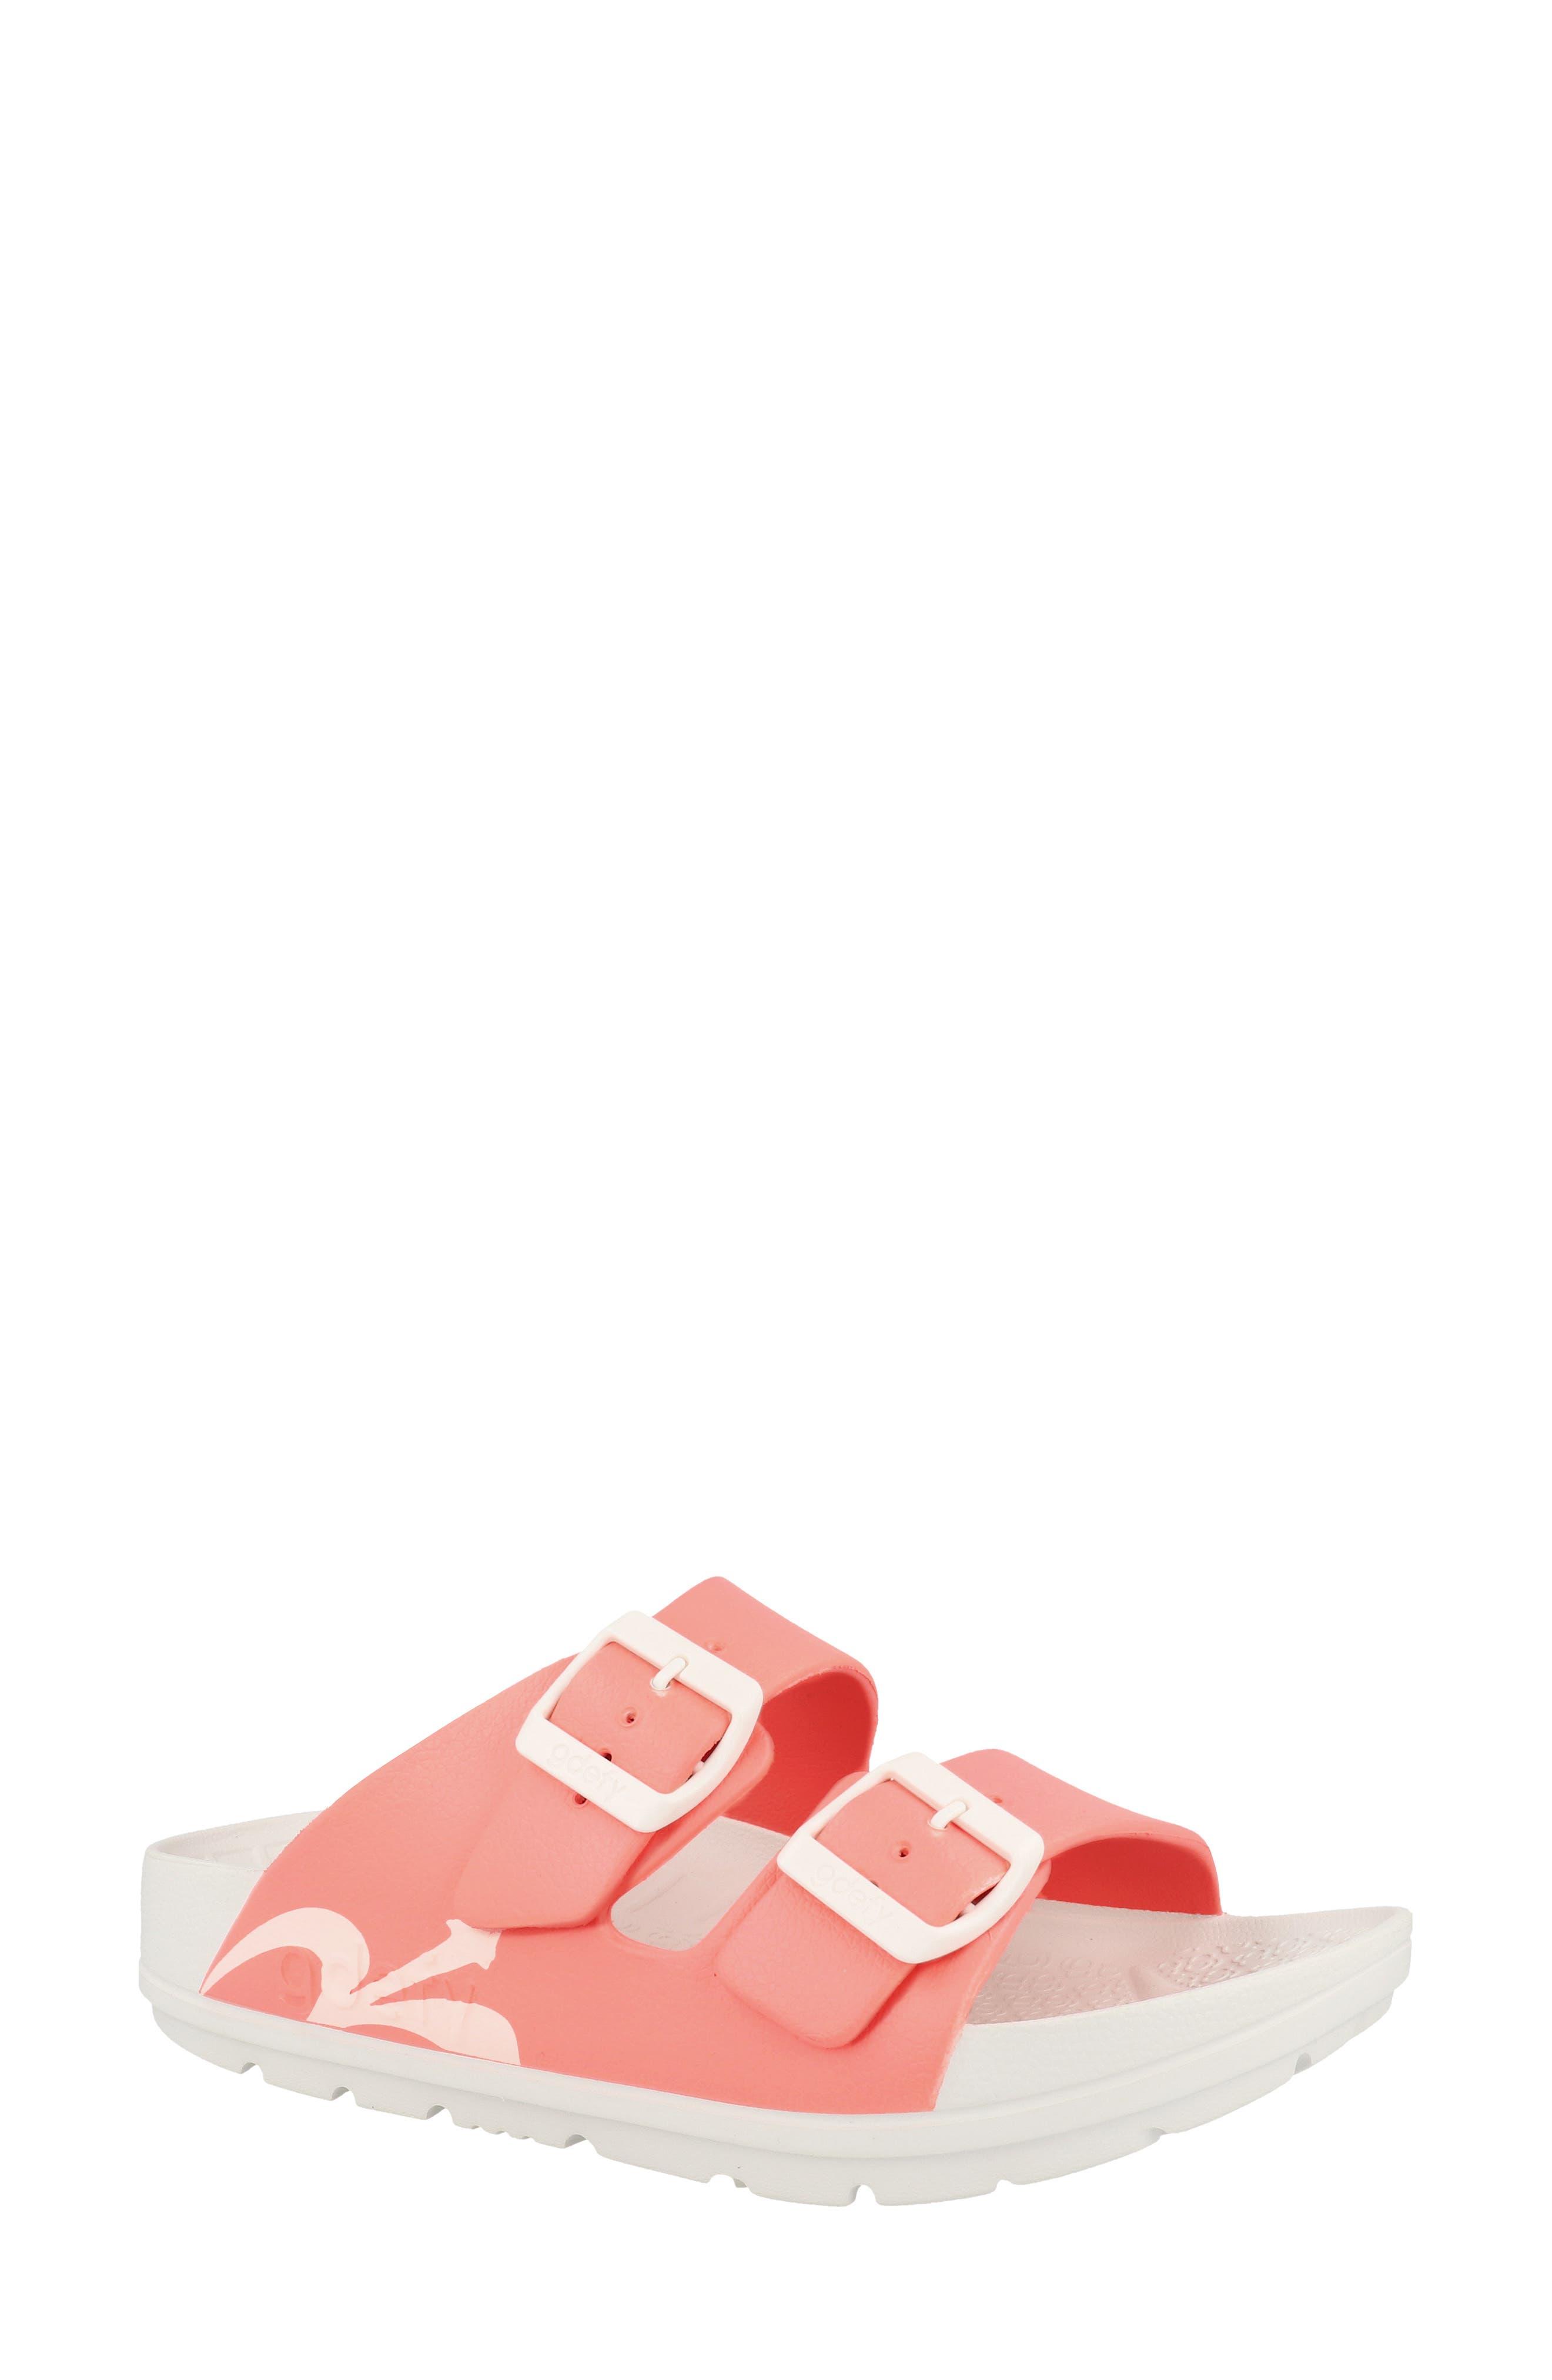 Upbov Slide Sandal